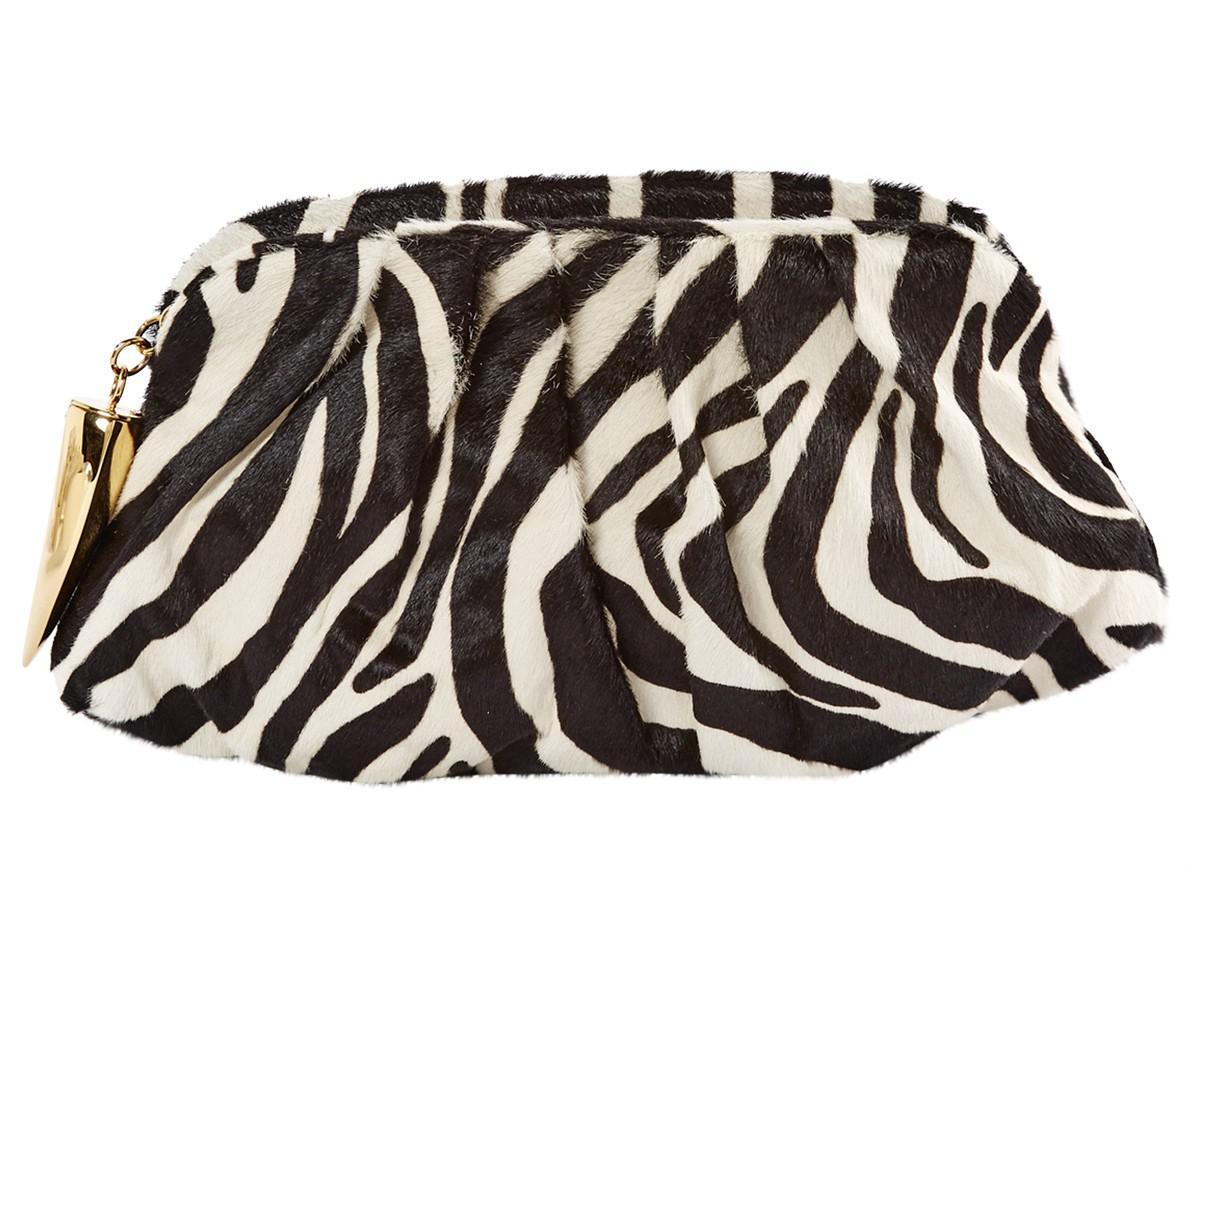 Giuseppe Zanotti Pre-owned - Ponyhair-style calfskin clutch bag ExX4XL